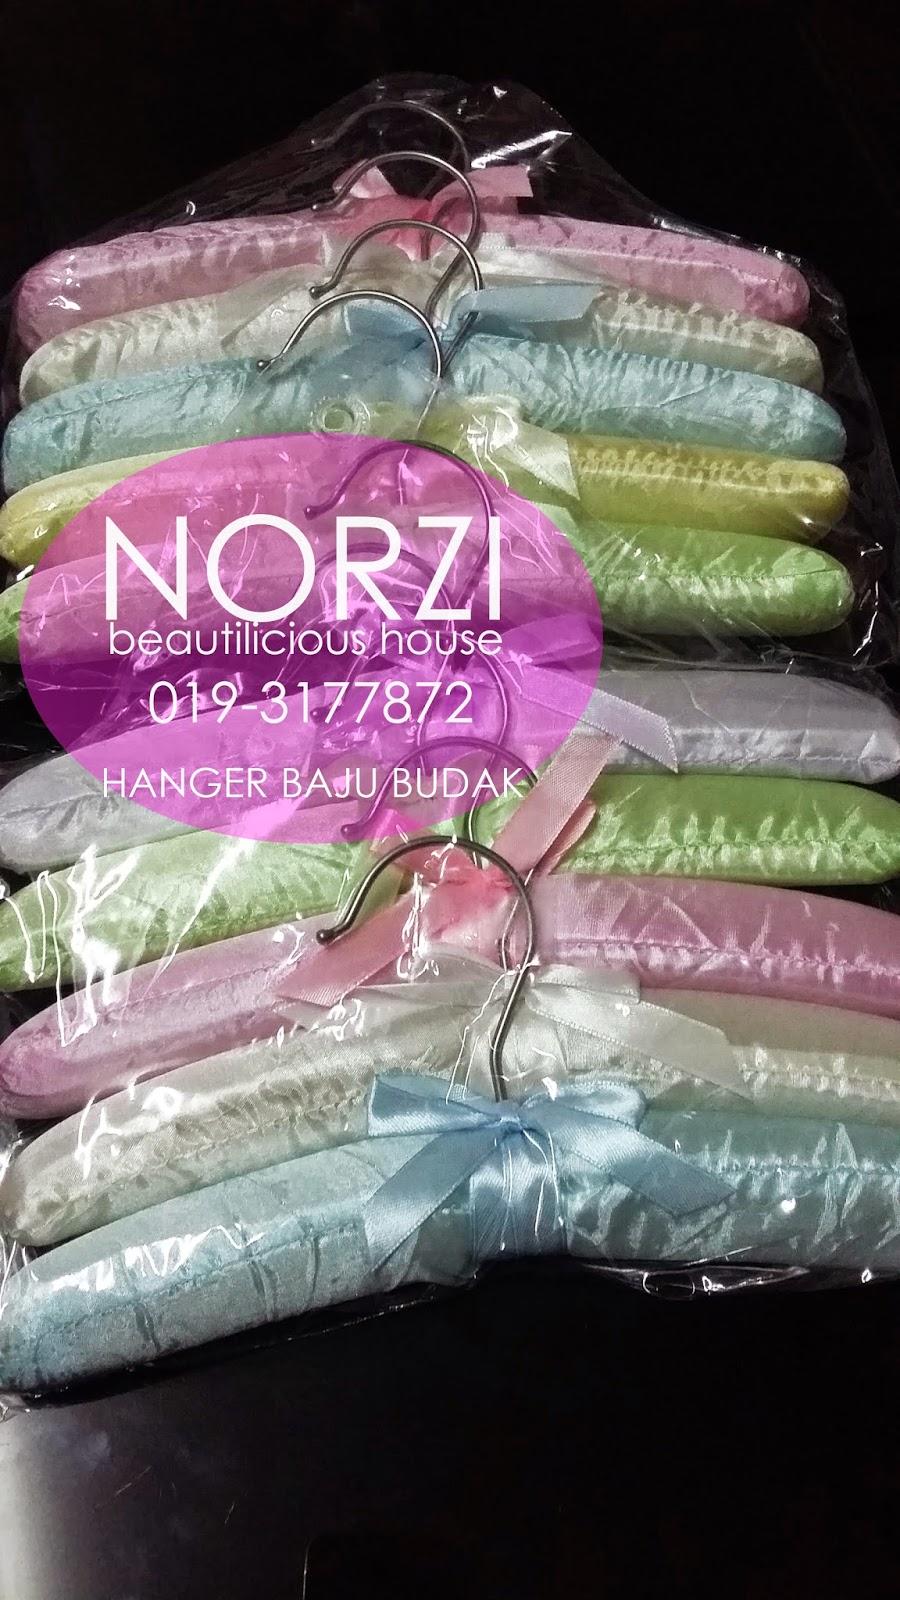 http://norzibeautilicioushouse.blogspot.com/2015/03/hanger-untuk-pakaian-kanak-kanak.html